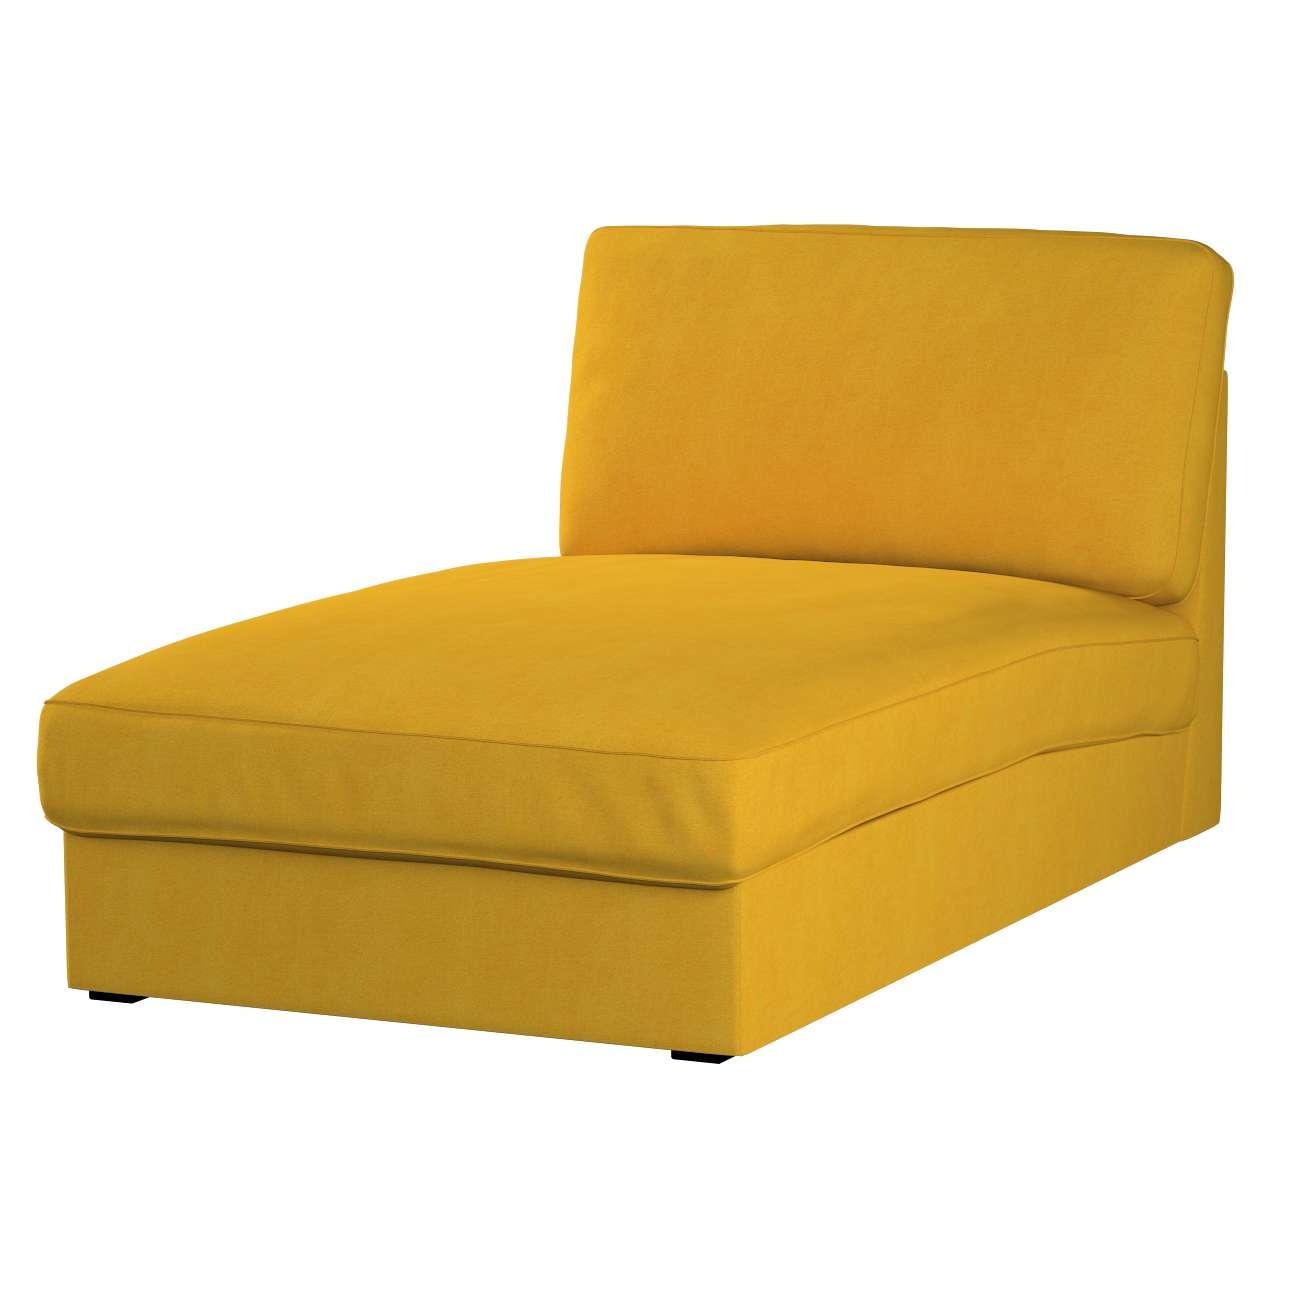 KIVIK gulimojo krėslo užvalkalas Kivik chaise longue kolekcijoje Etna , audinys: 705-04